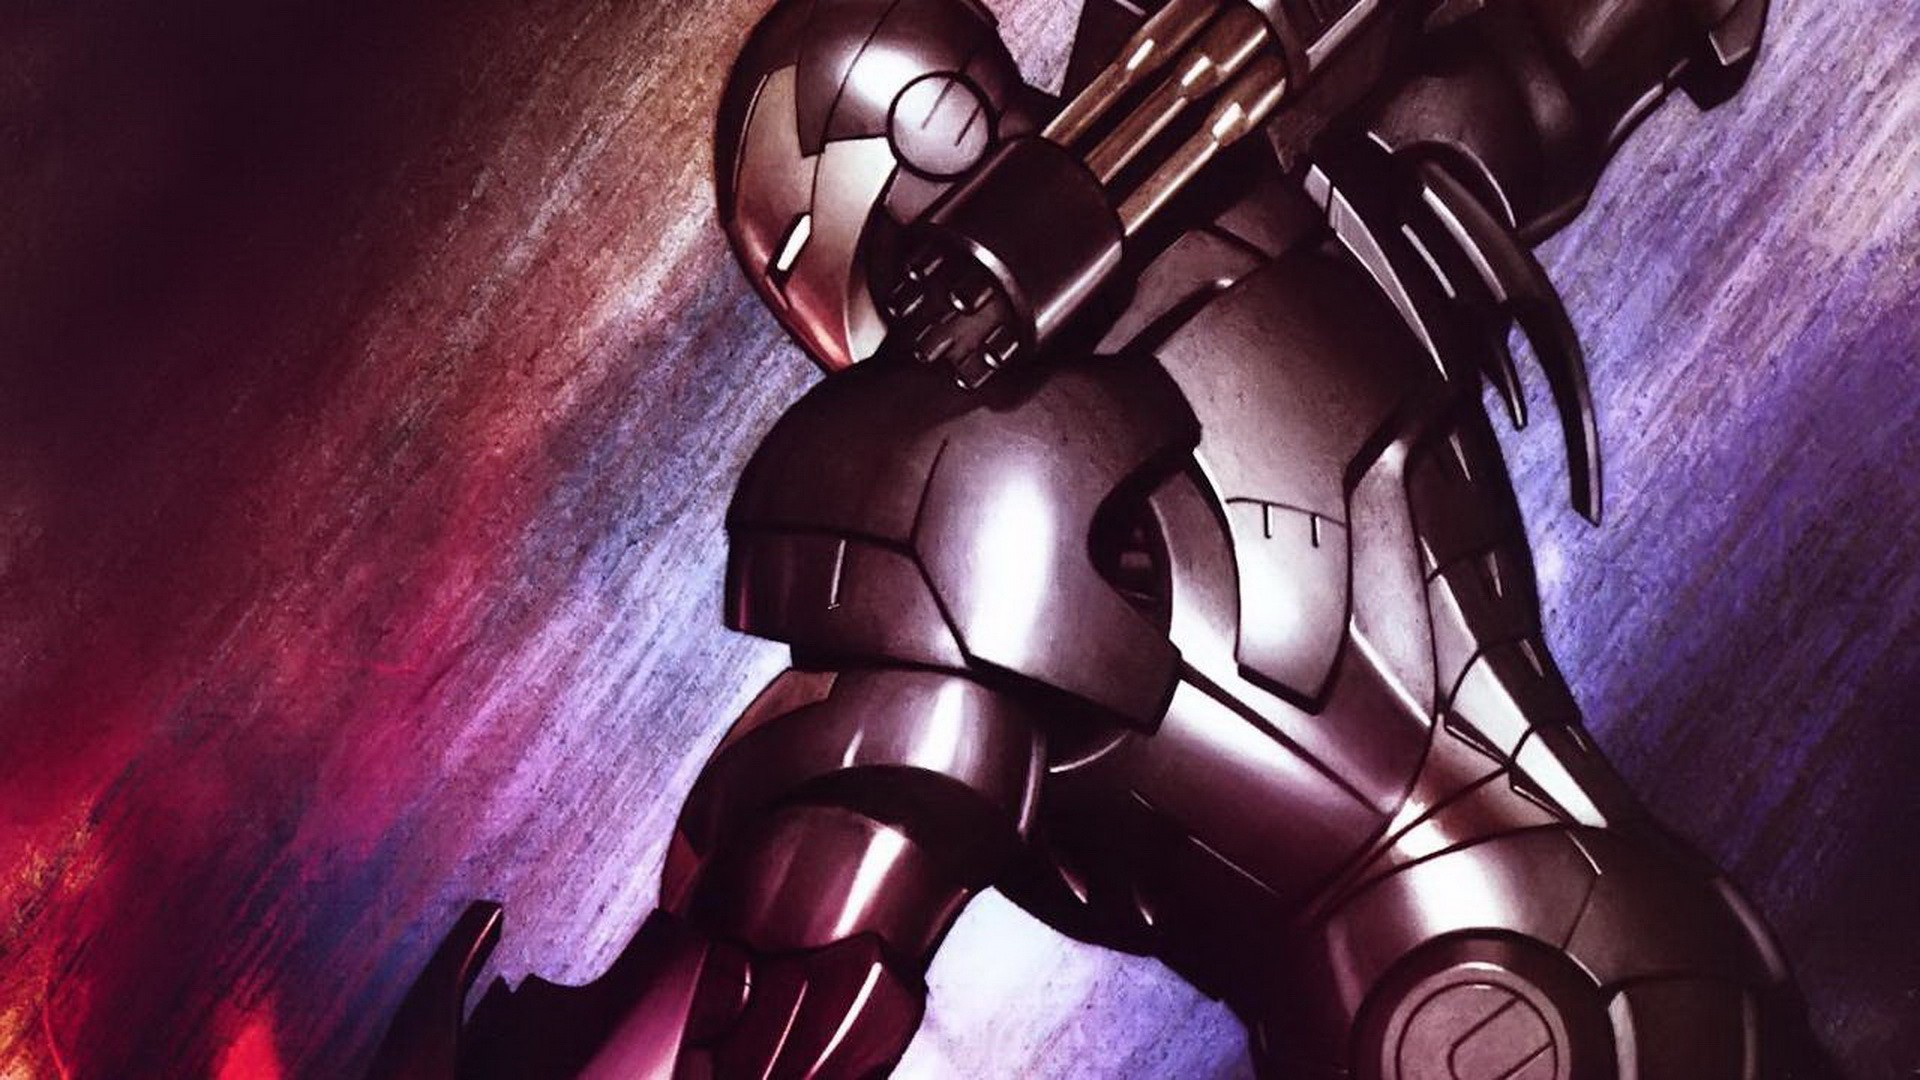 Iron Man comics War Machine Marvel Comics wallpaper | | 196682 |  WallpaperUP